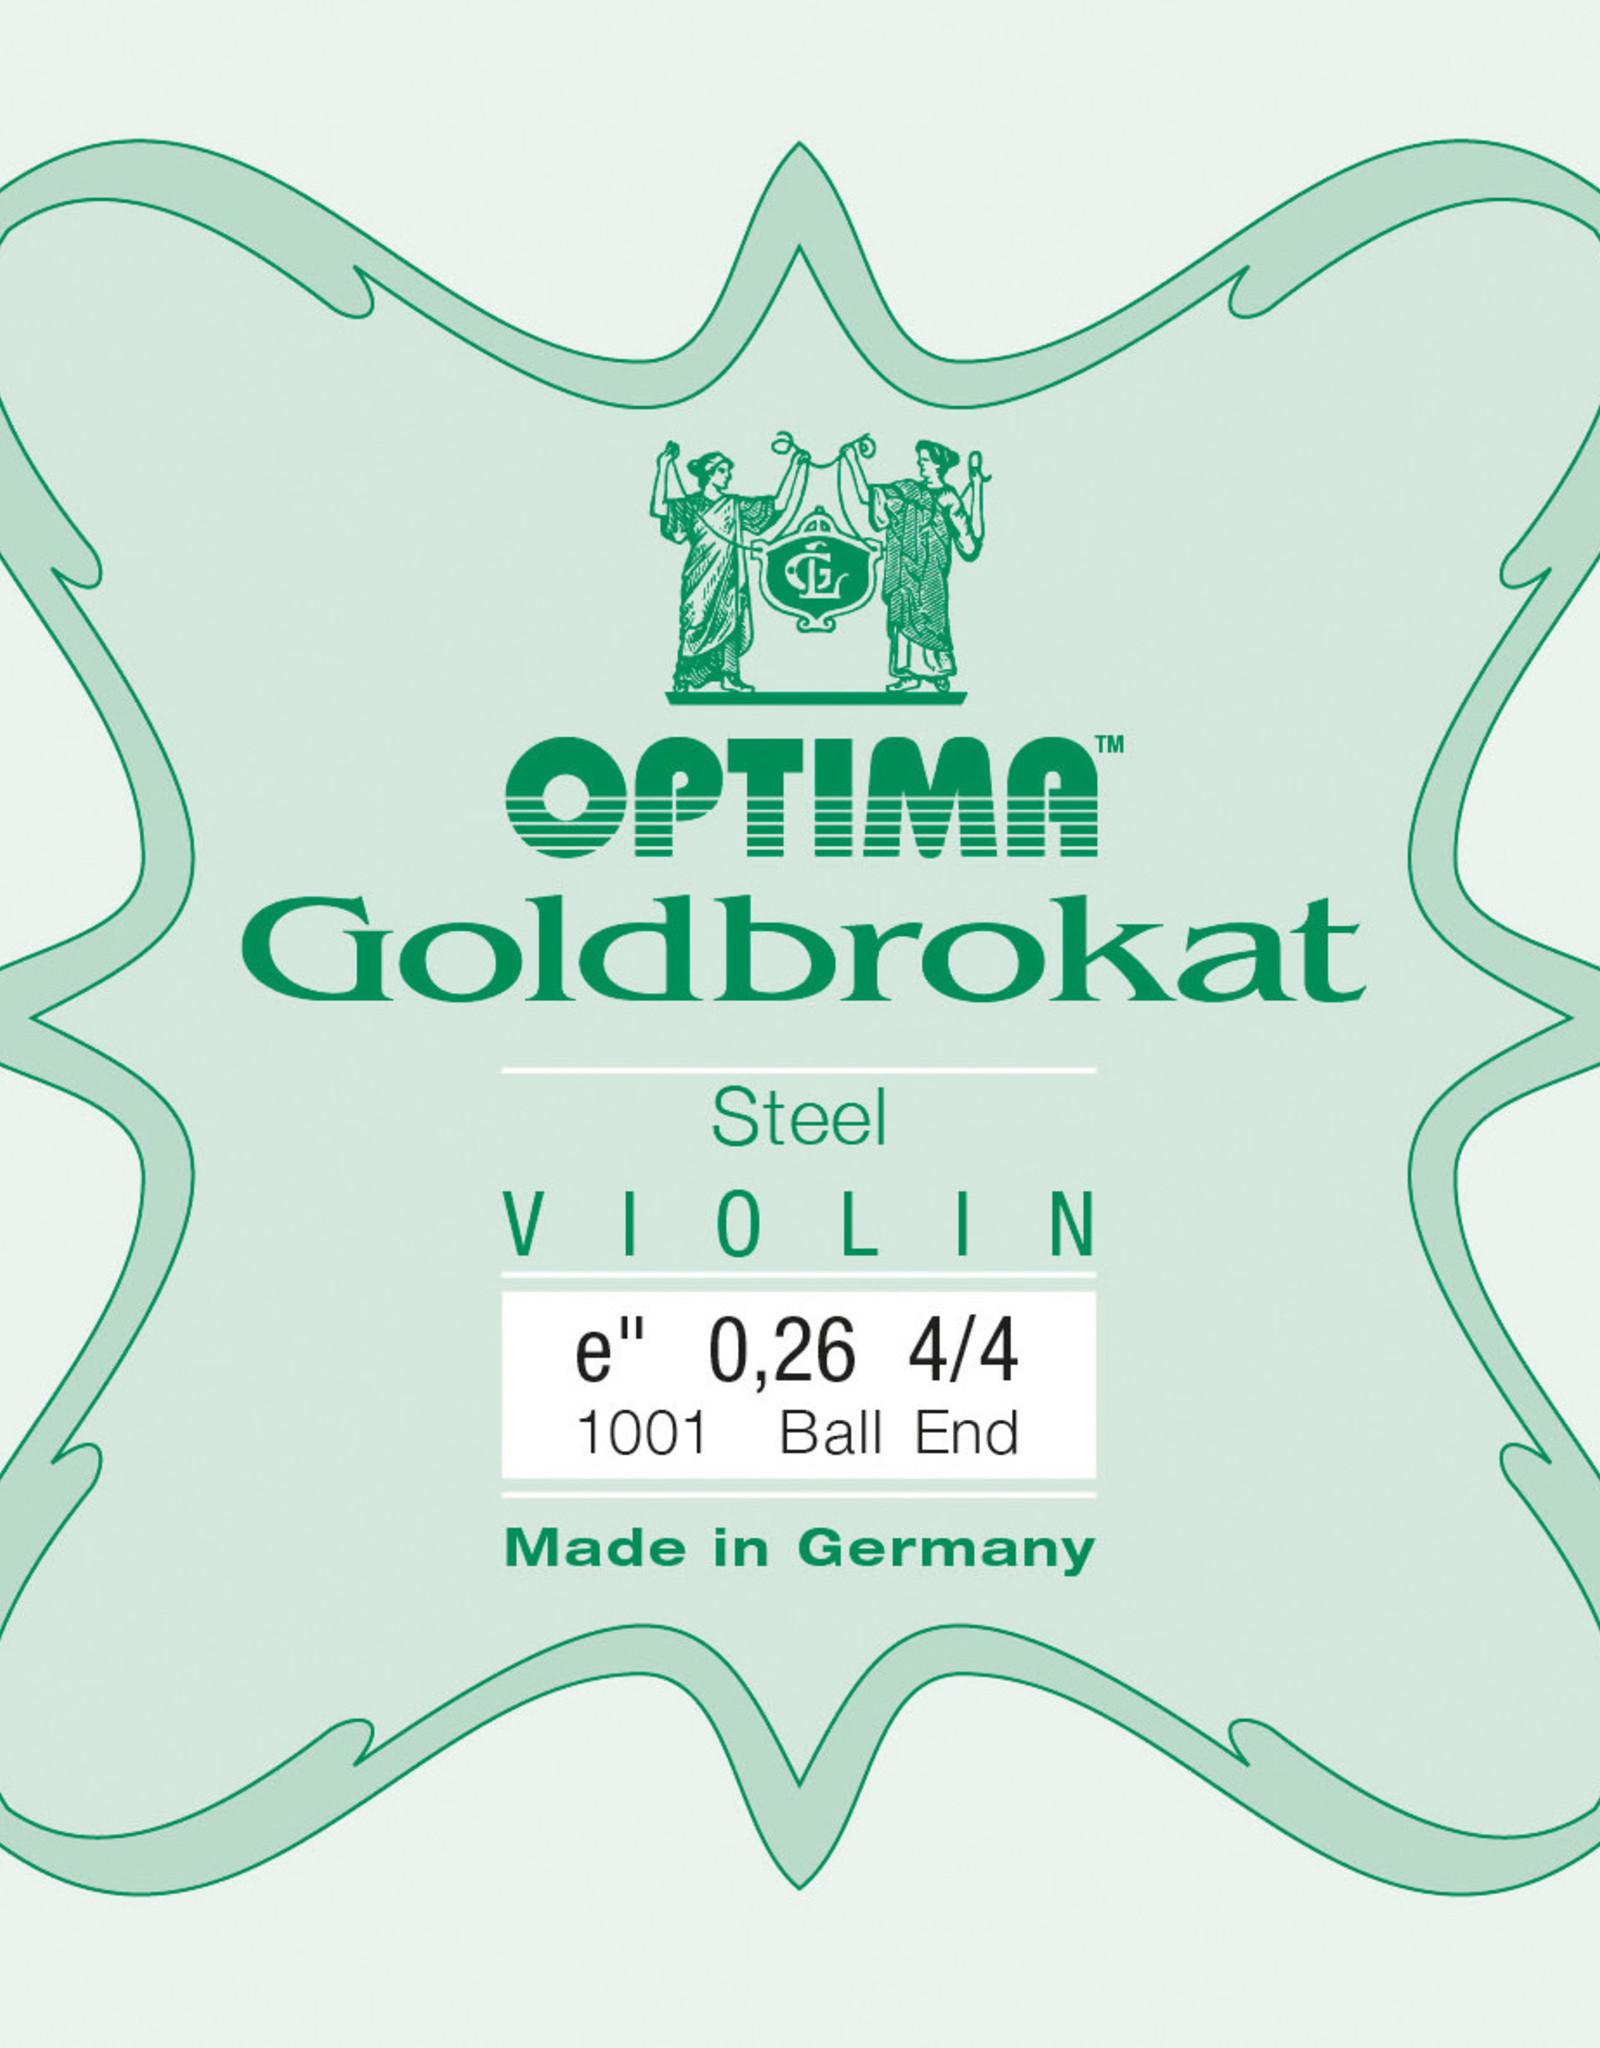 OPTIMA Goldbrokat (Lenzner) 4/4, mi-snaar (e1), loop end, 0,26, medium